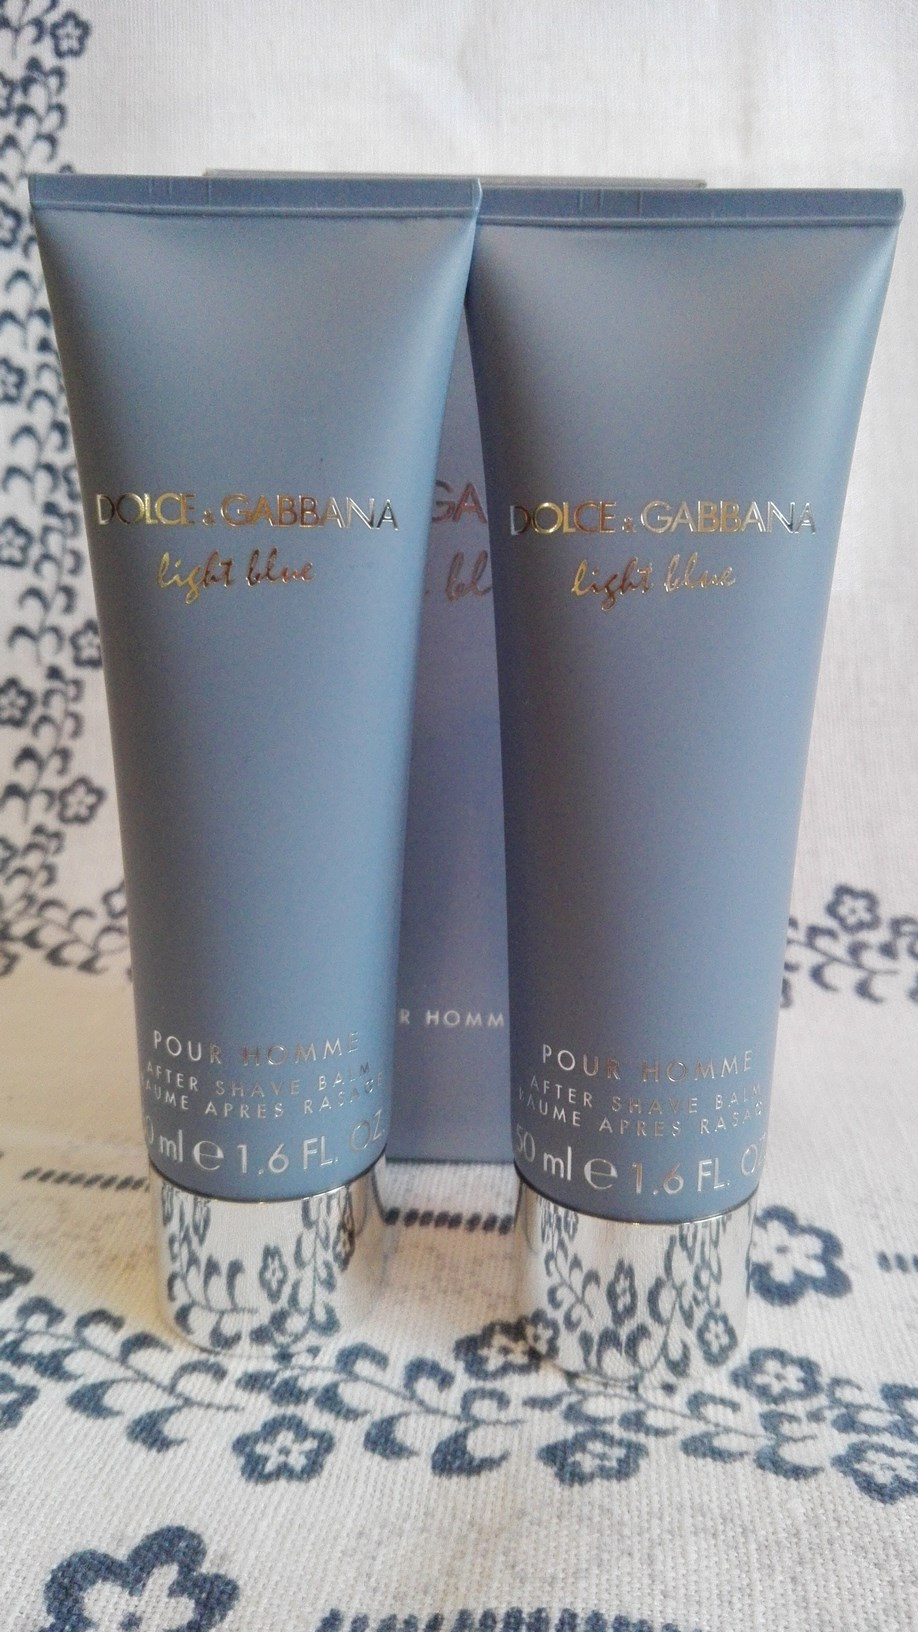 Dolce Gabbana Light Blue baslasm po goleniu -50%